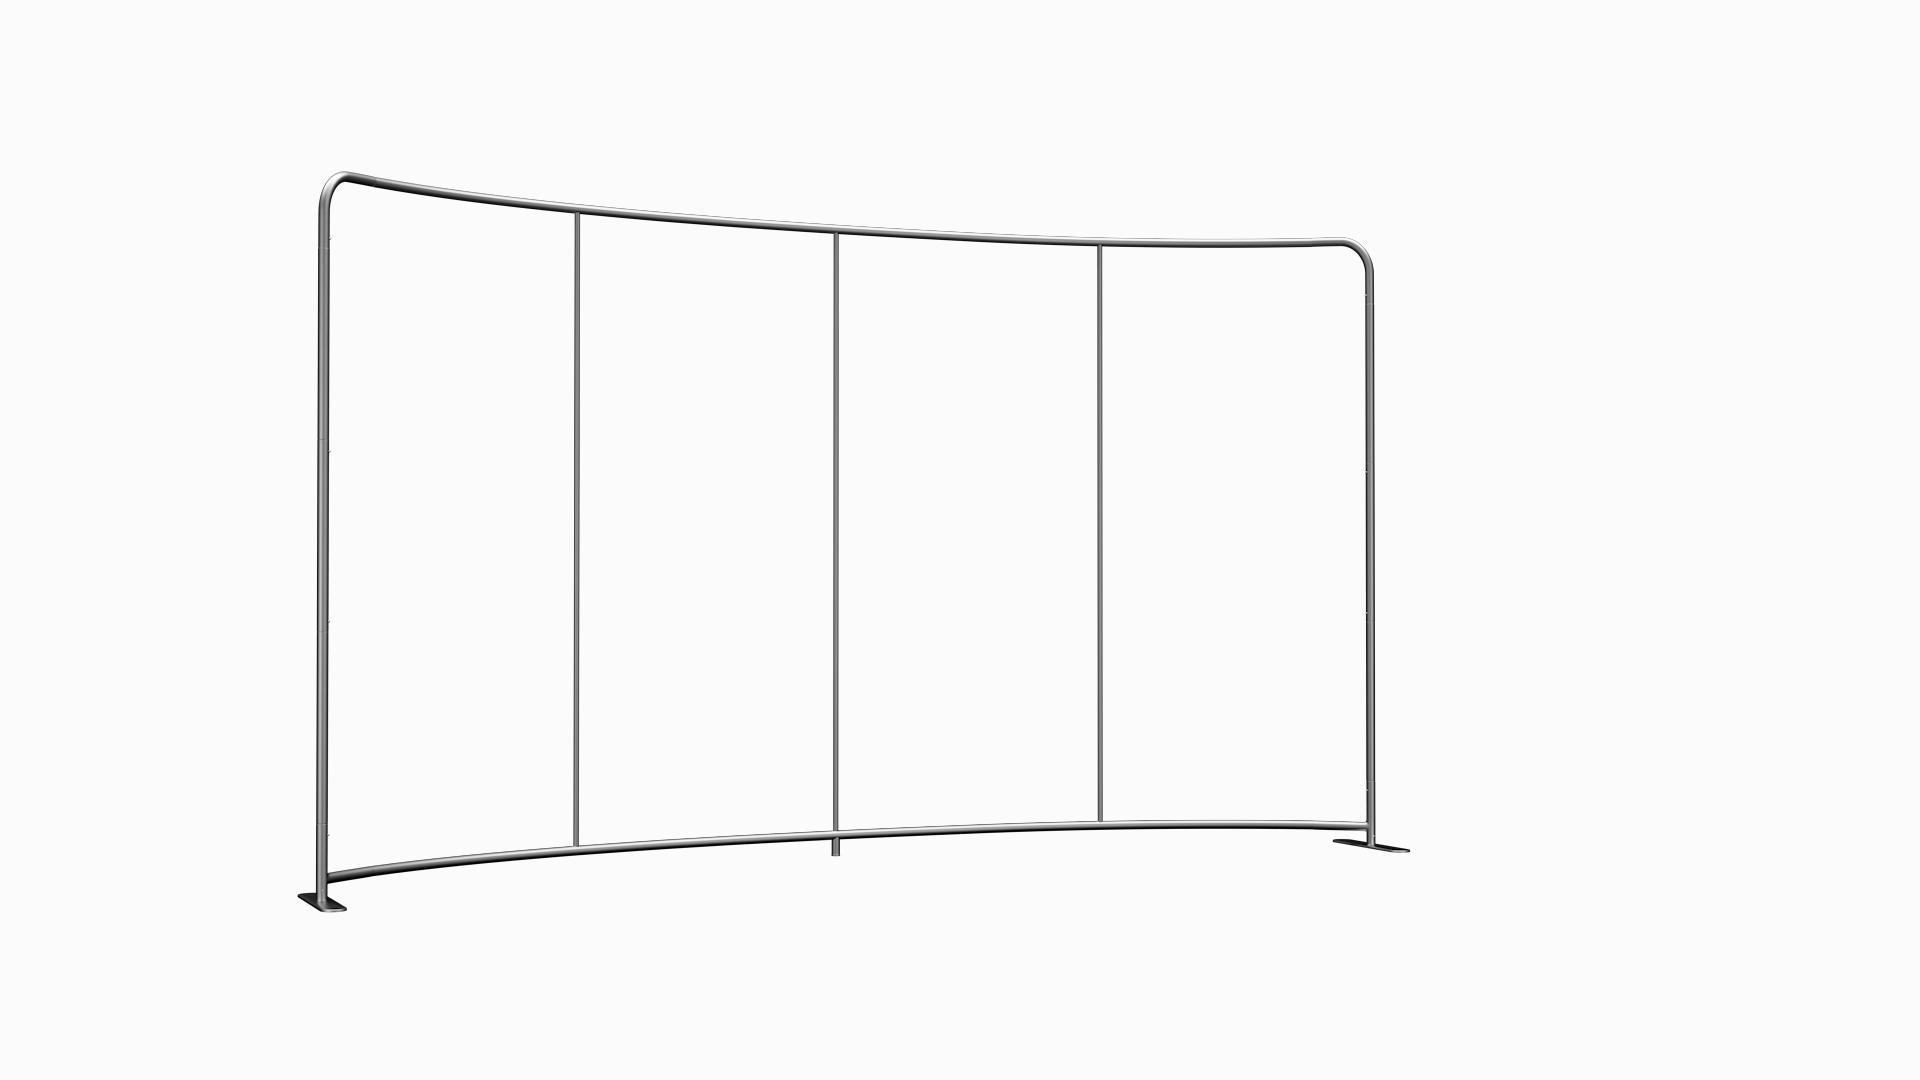 Mur d'image TxW Curved 400 cm x 228 cm